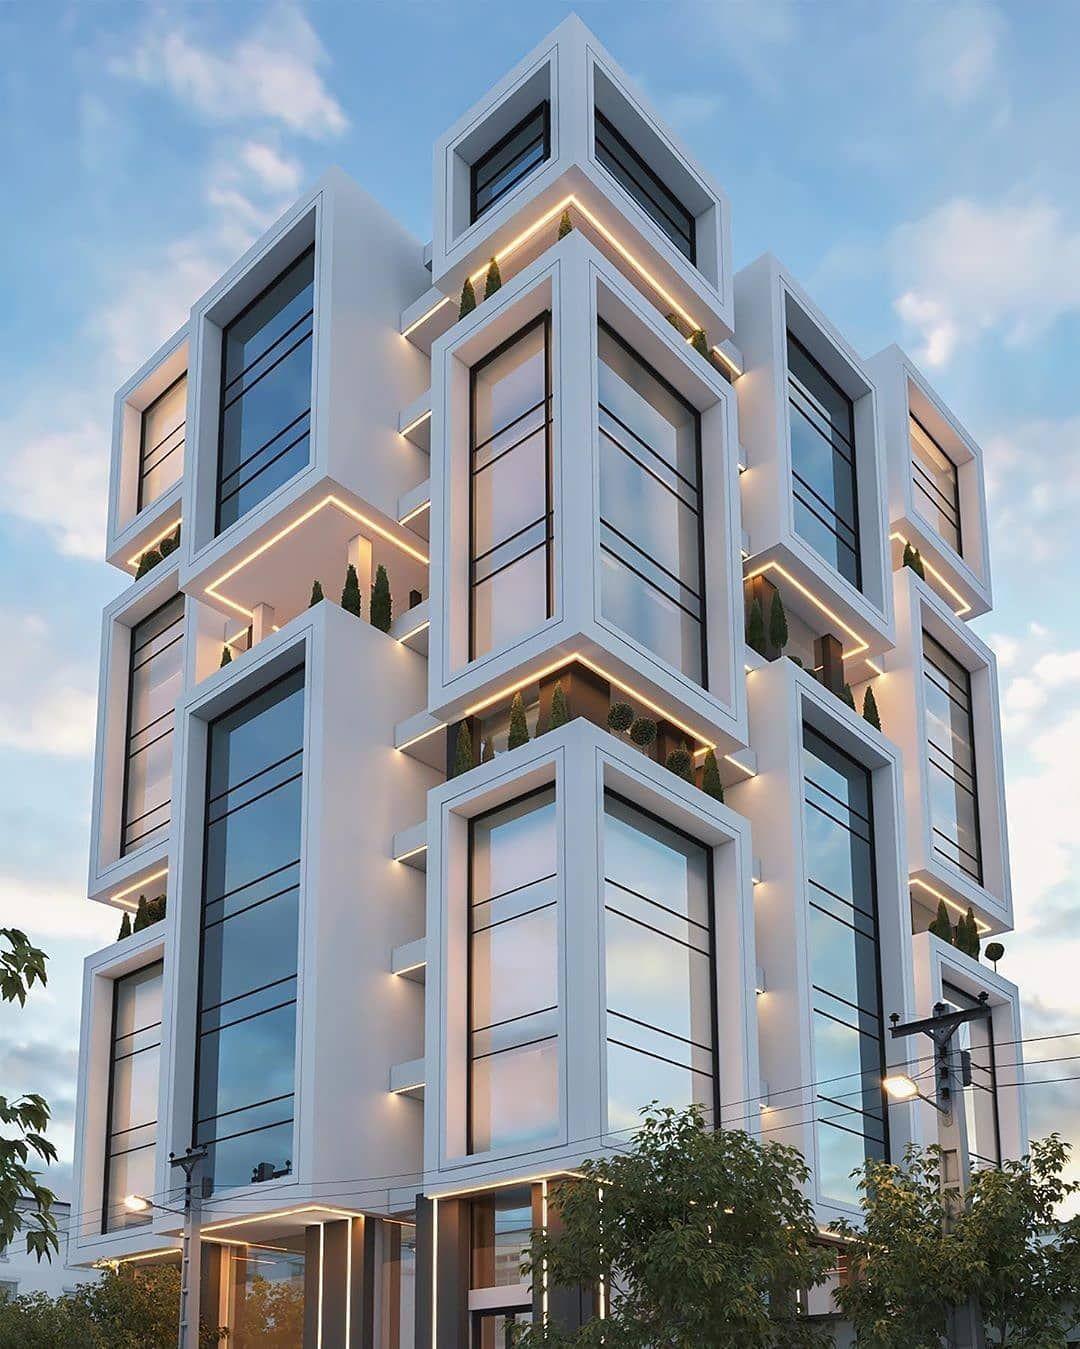 3dmax V Ray Magazine On Instagram Residential Design Architec Residential Building Design Architecture Building Design Residential Architecture Apartment